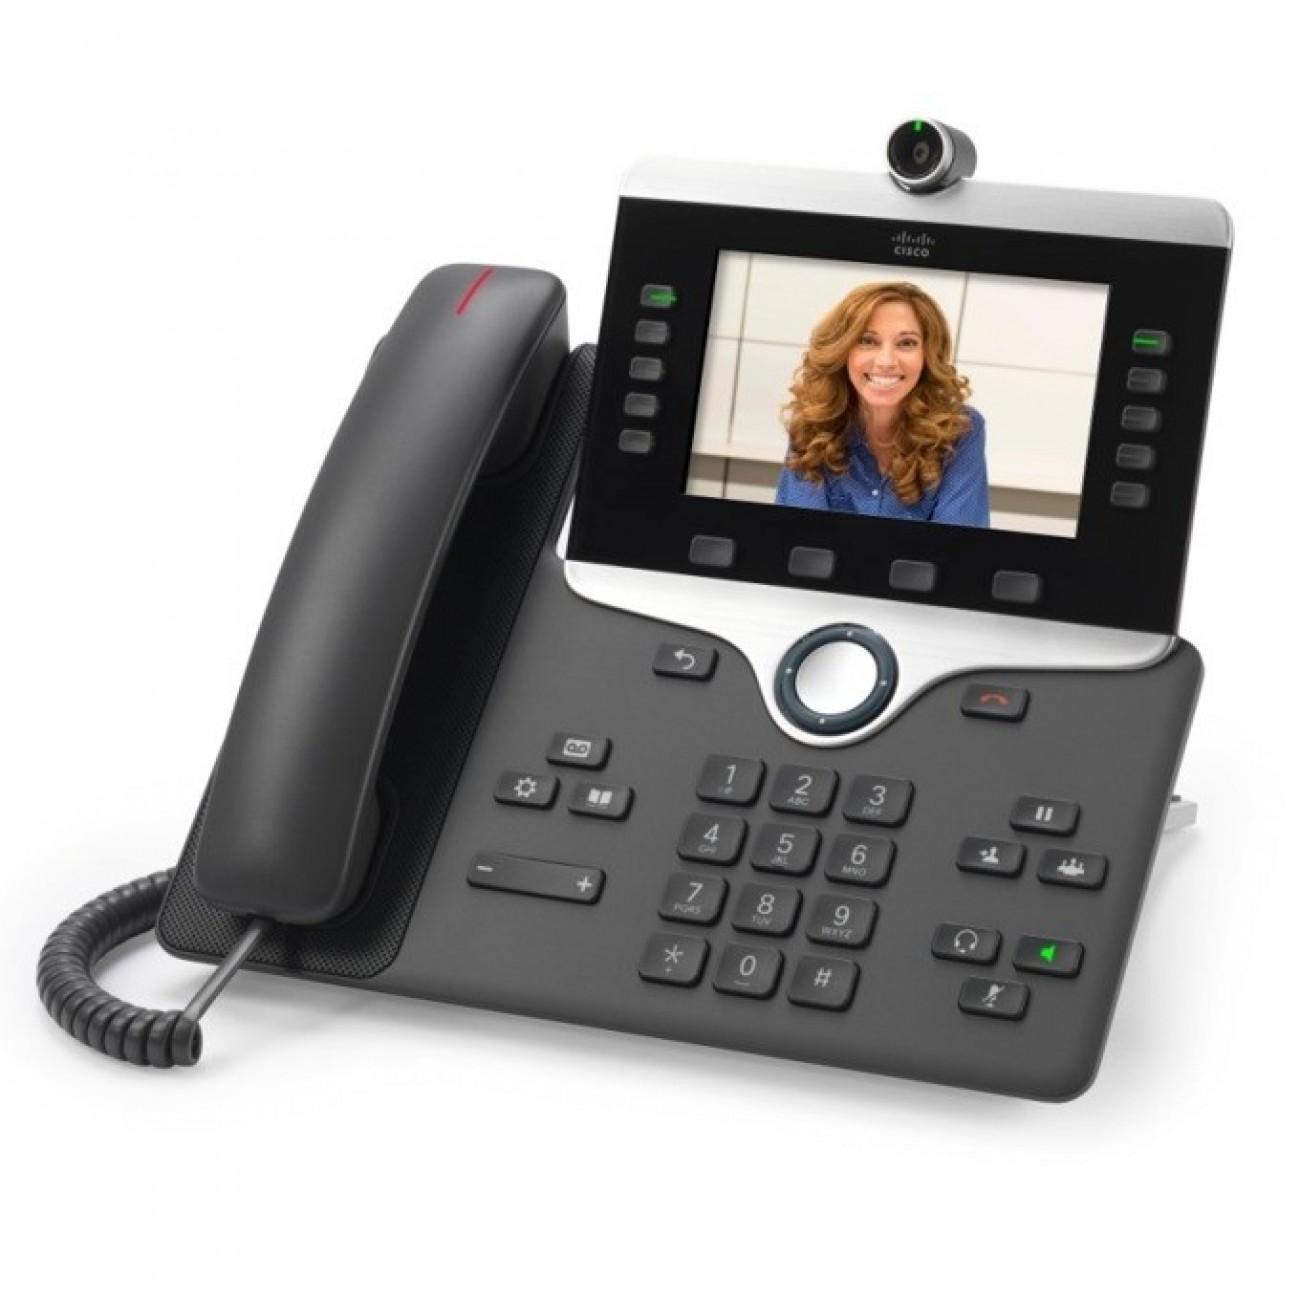 VoIP телефон Cisco IP Phone 8845, 5.0 (12.70 cm) WVGA цветен дисплей, 5 линии, 2x LAN1000, PoE, тъмно сив в VoIP Телефони -  | Alleop